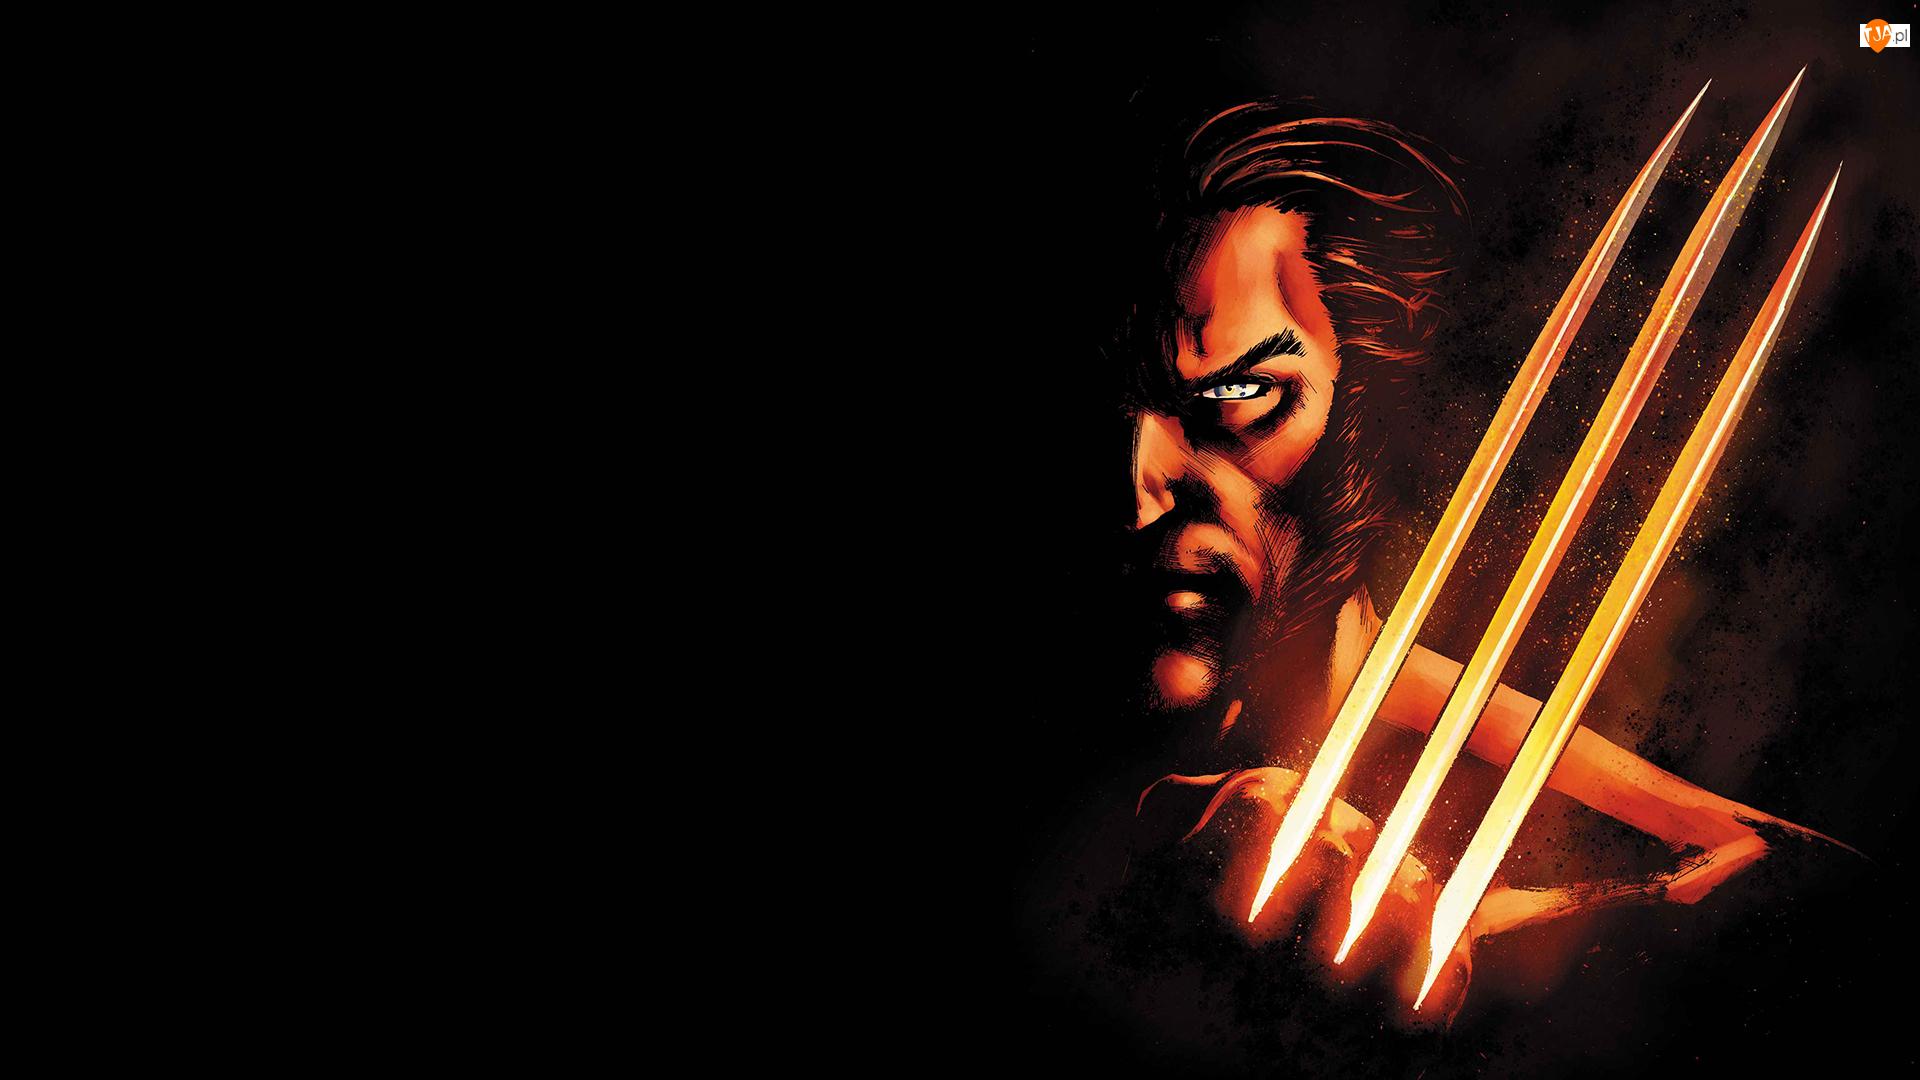 Grafika, Film, Postać, Aktor, X-Men, Logan, Hugh Jackman, Wolverine